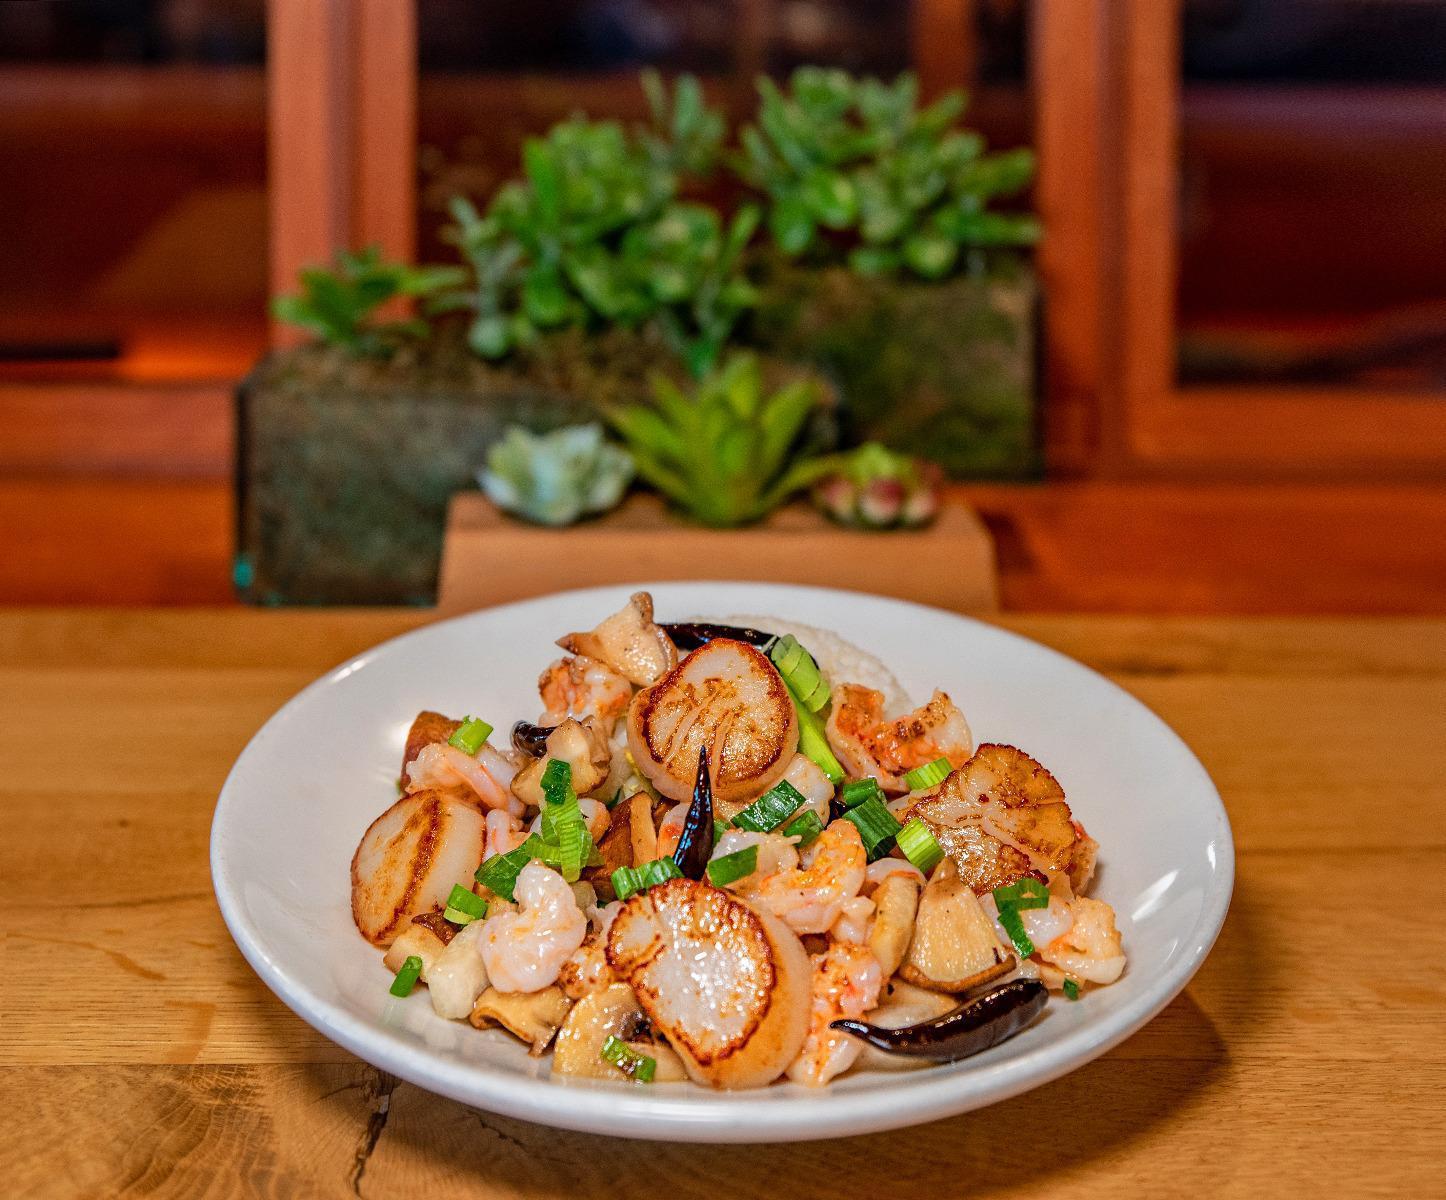 Ginger Sea Scallops & Shrimp